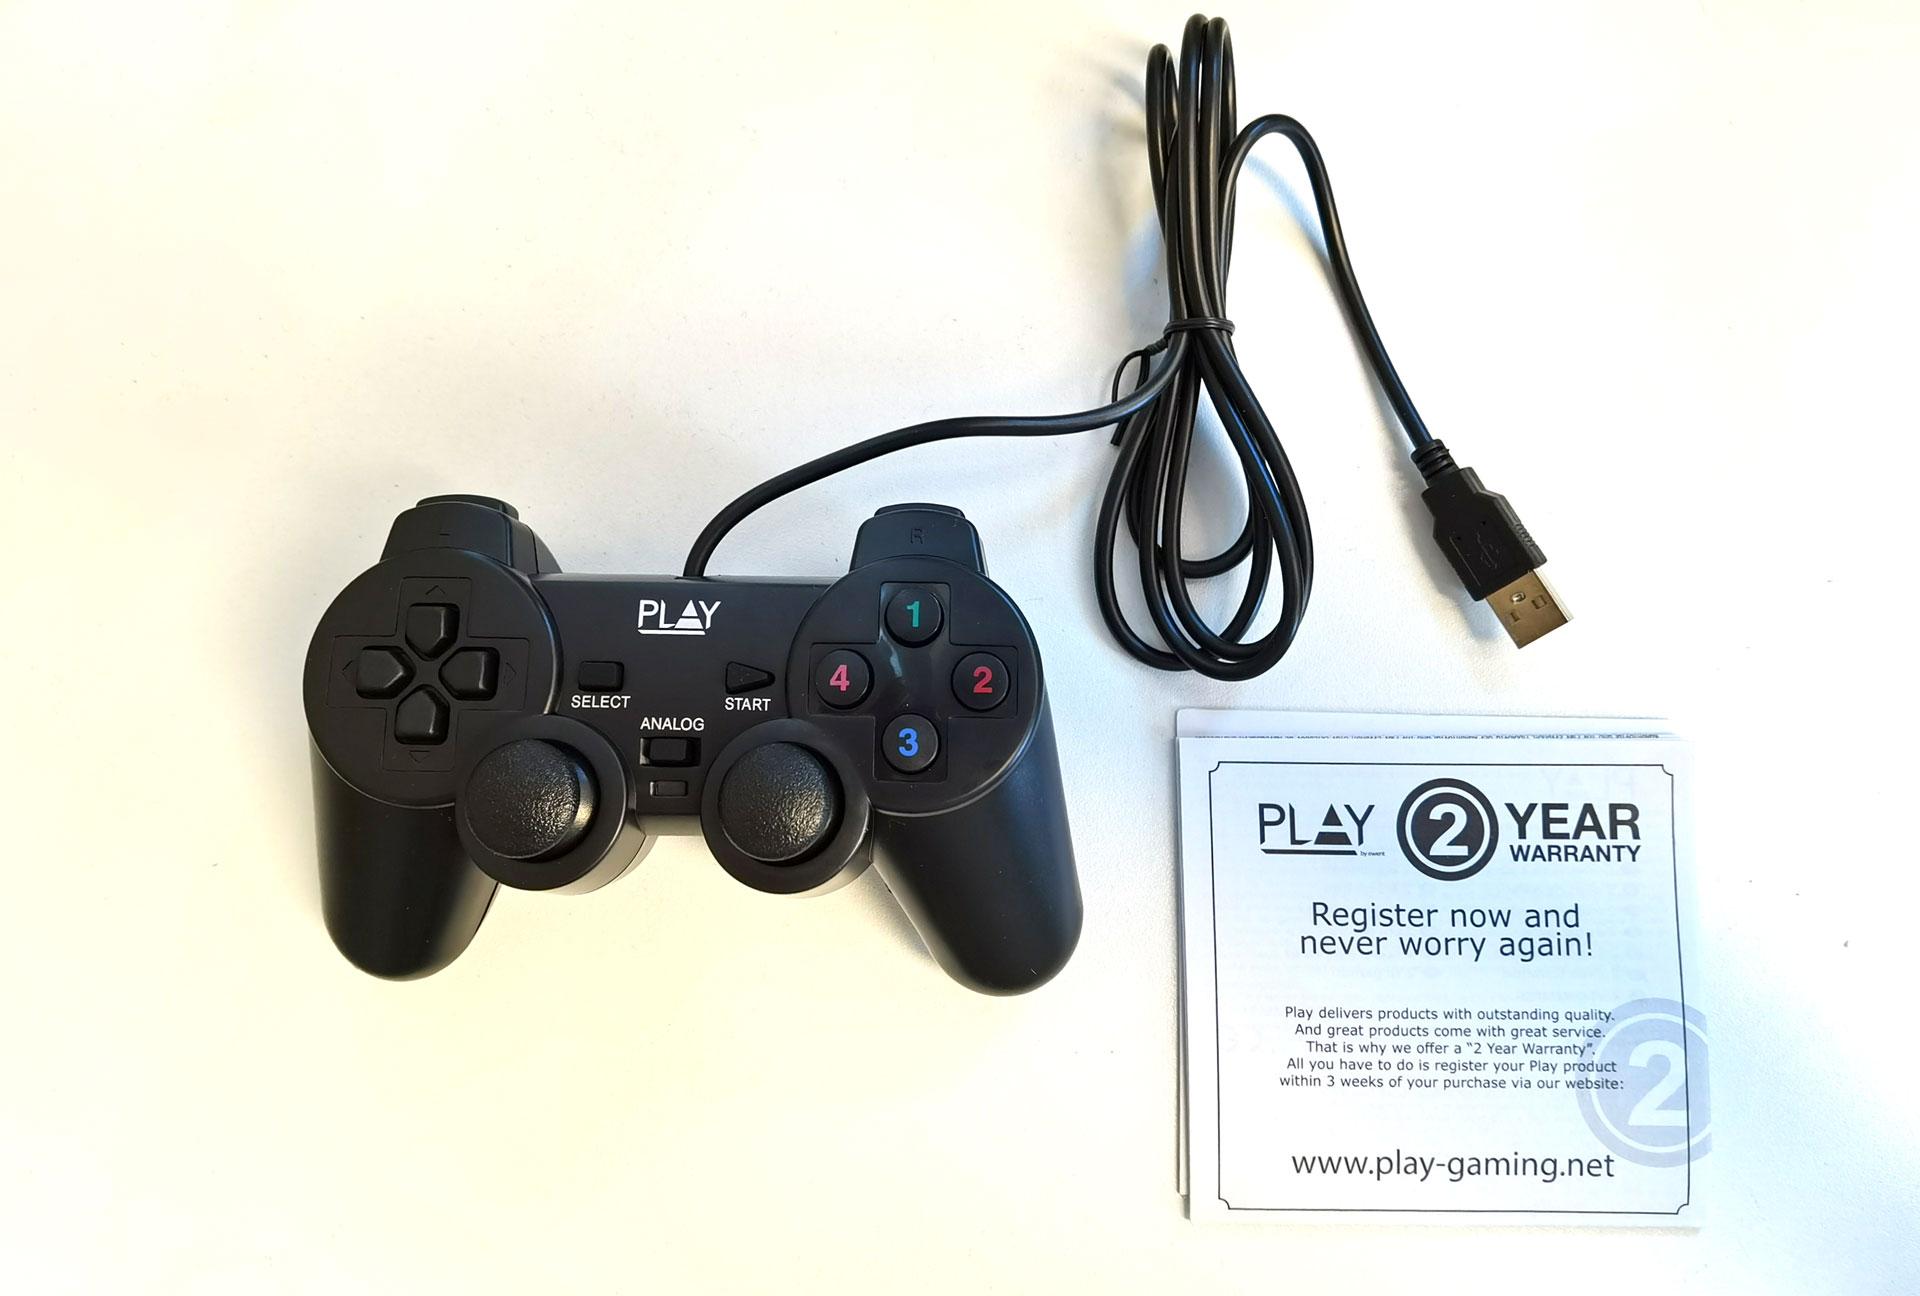 De Play by Ewent Wired USB Gamepad uitgepakt